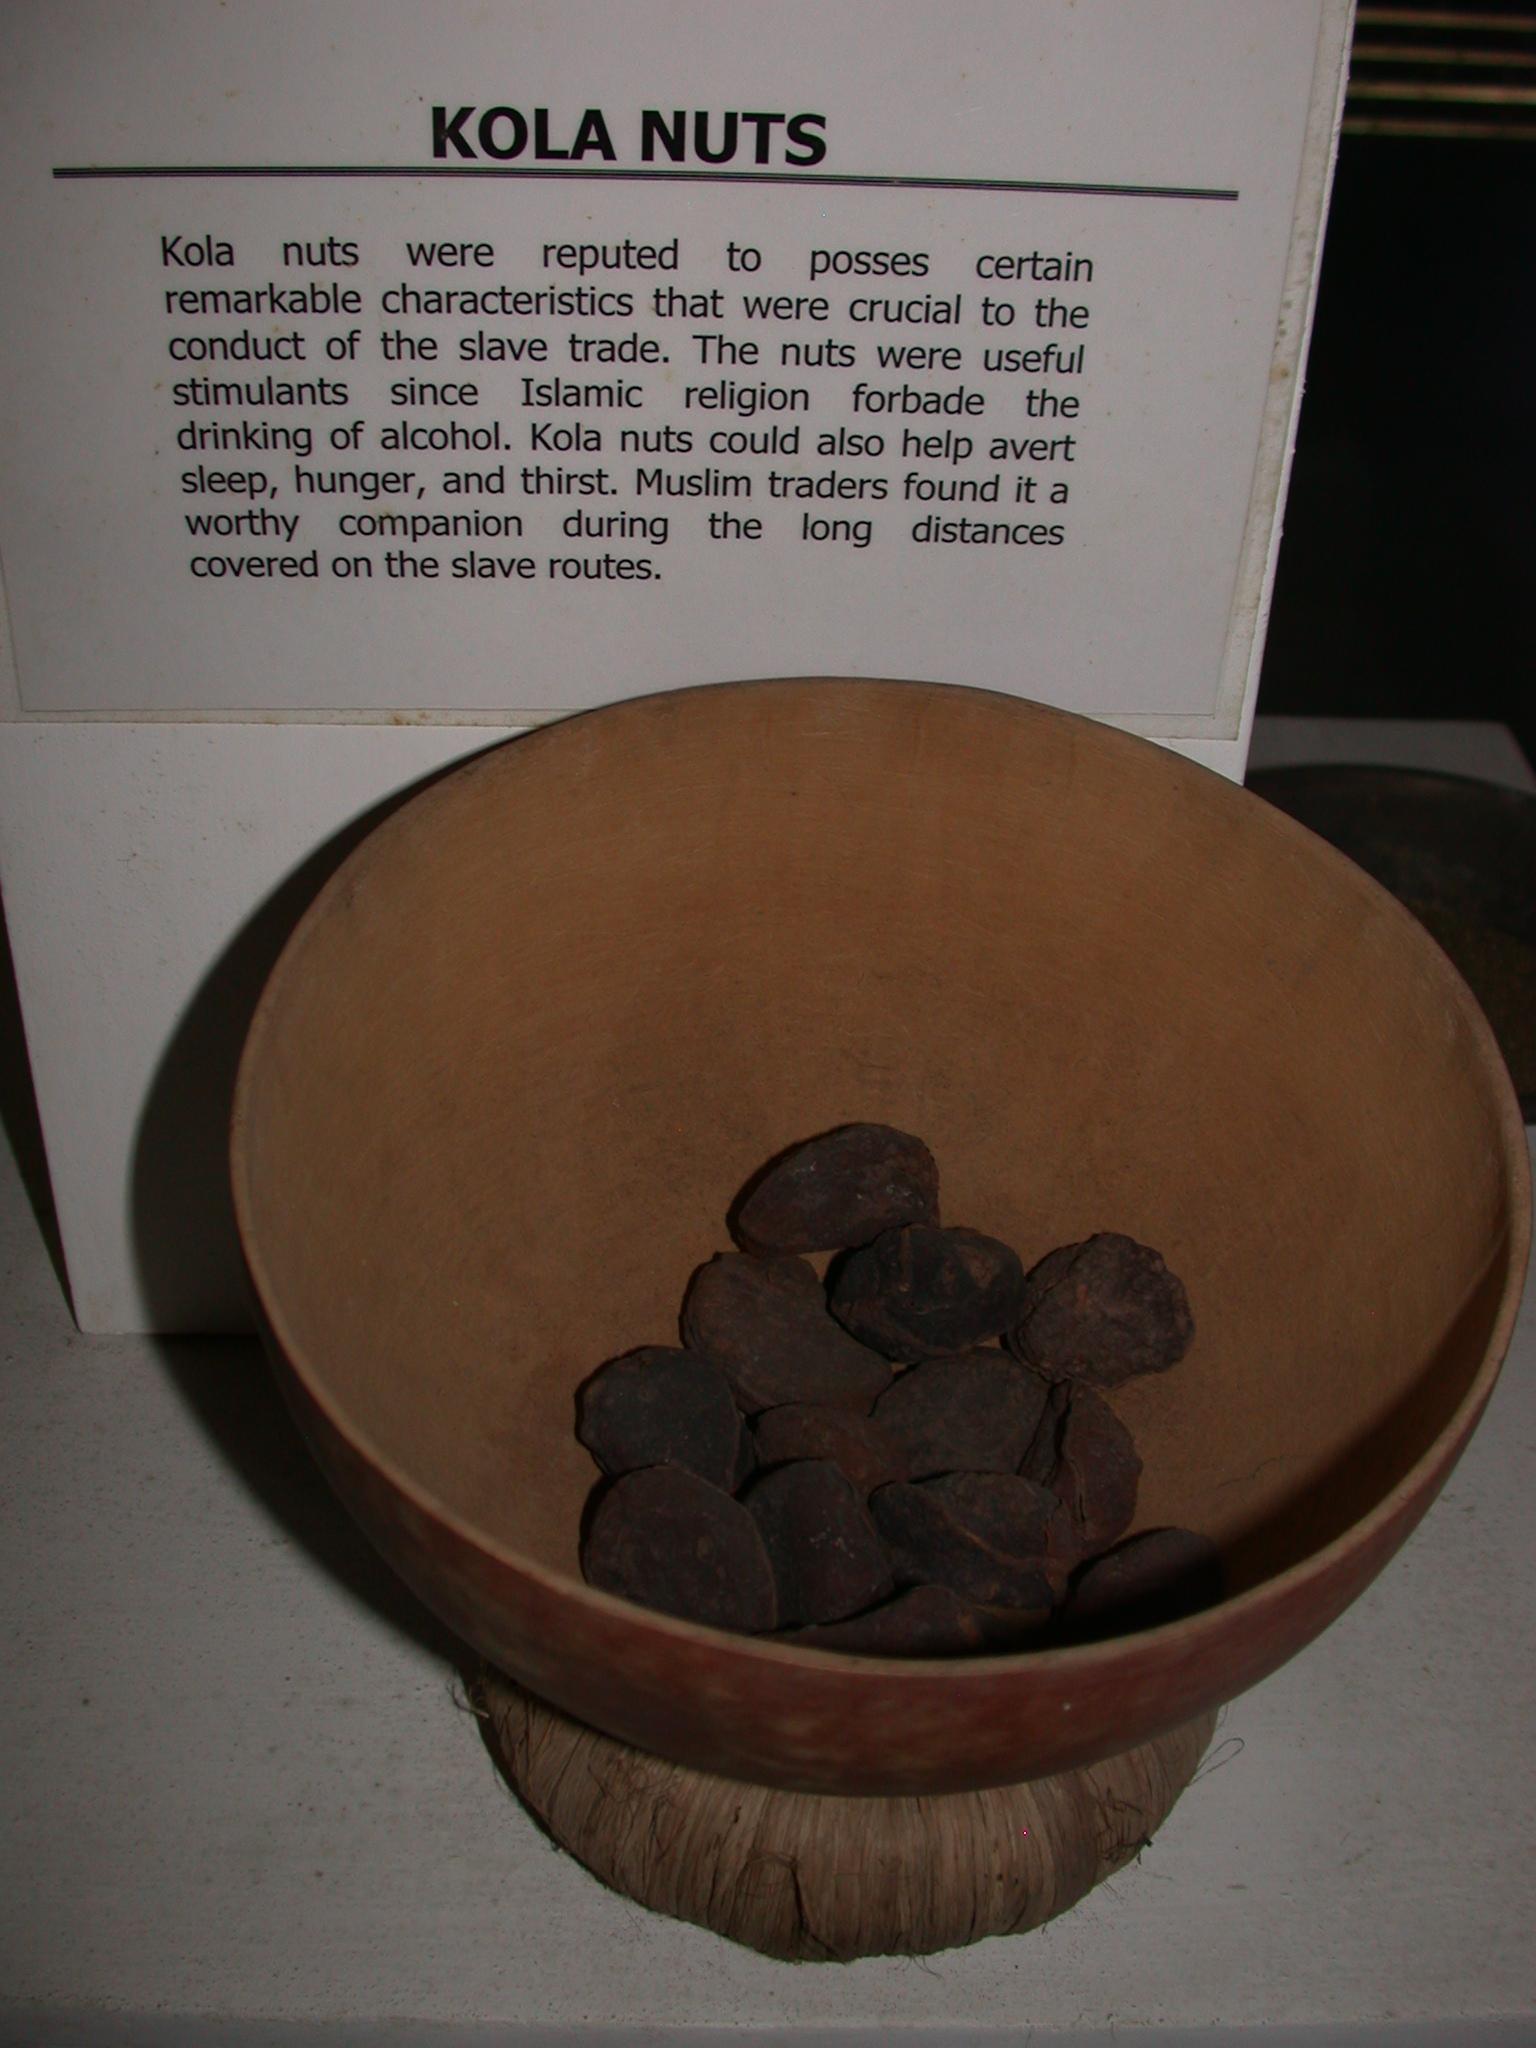 Kola Nuts and Description, National Museum, Accra, Ghana